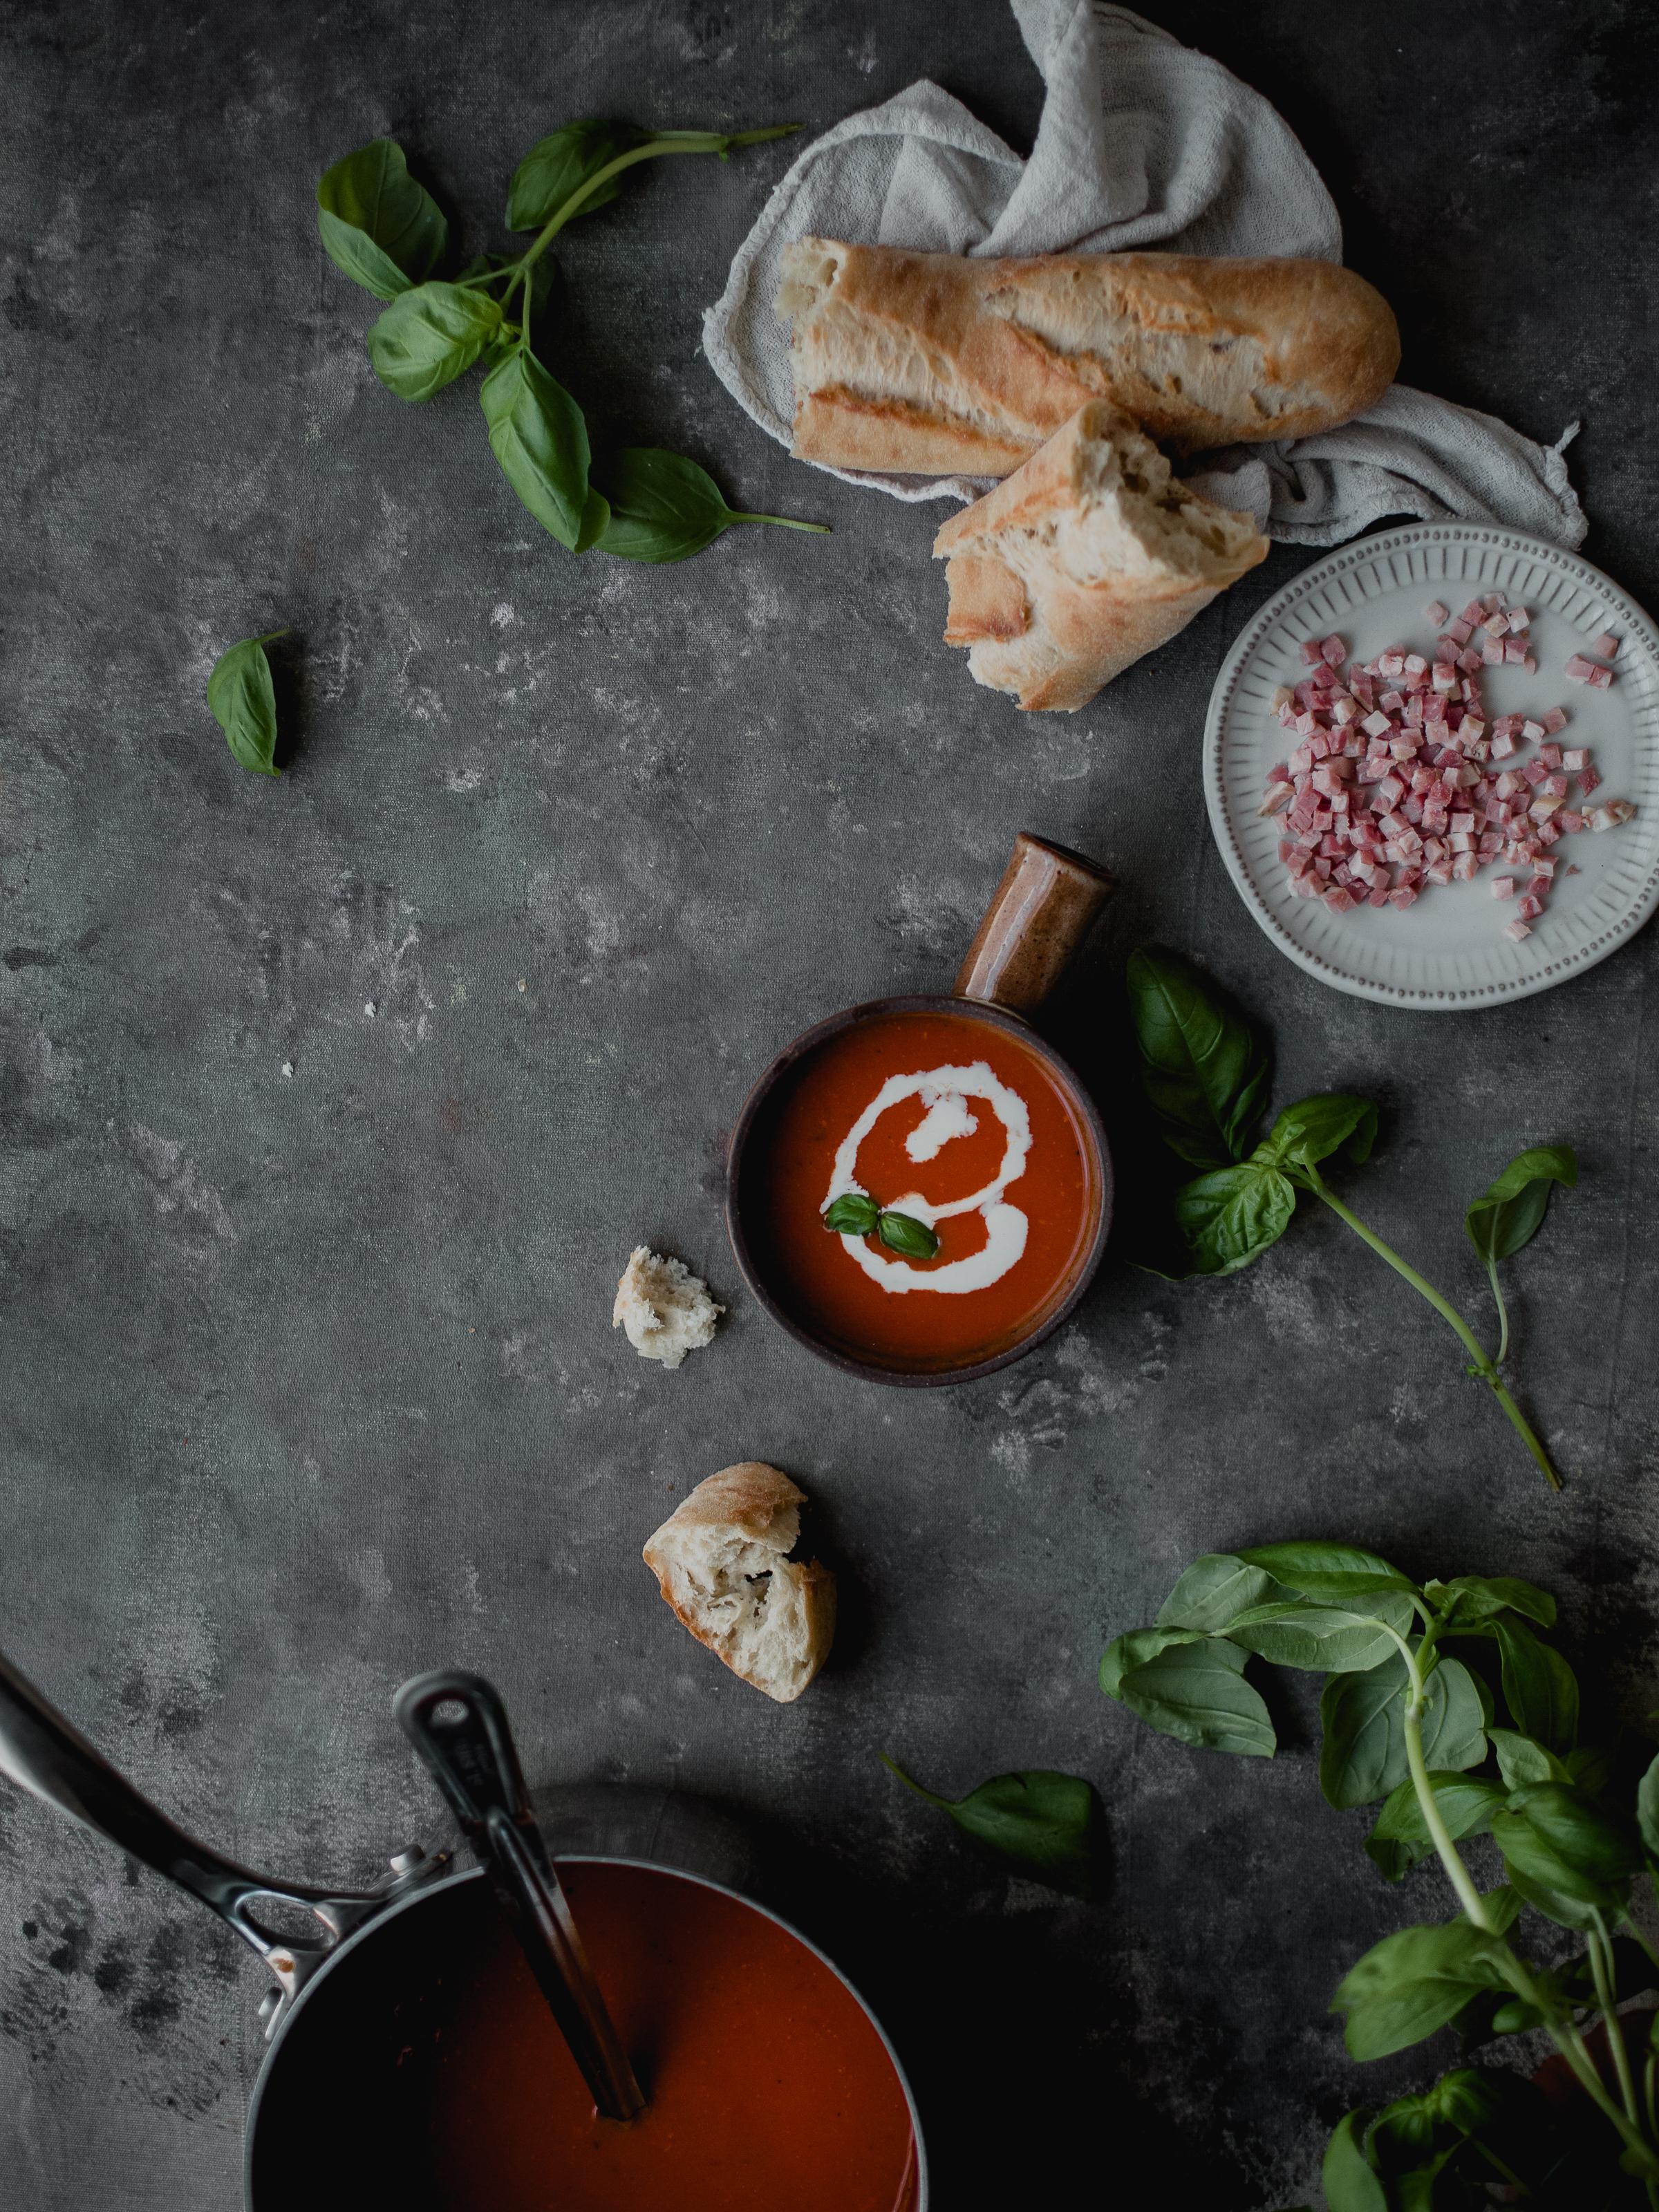 Umami tomato soup recipe | from scratch, mostly blog